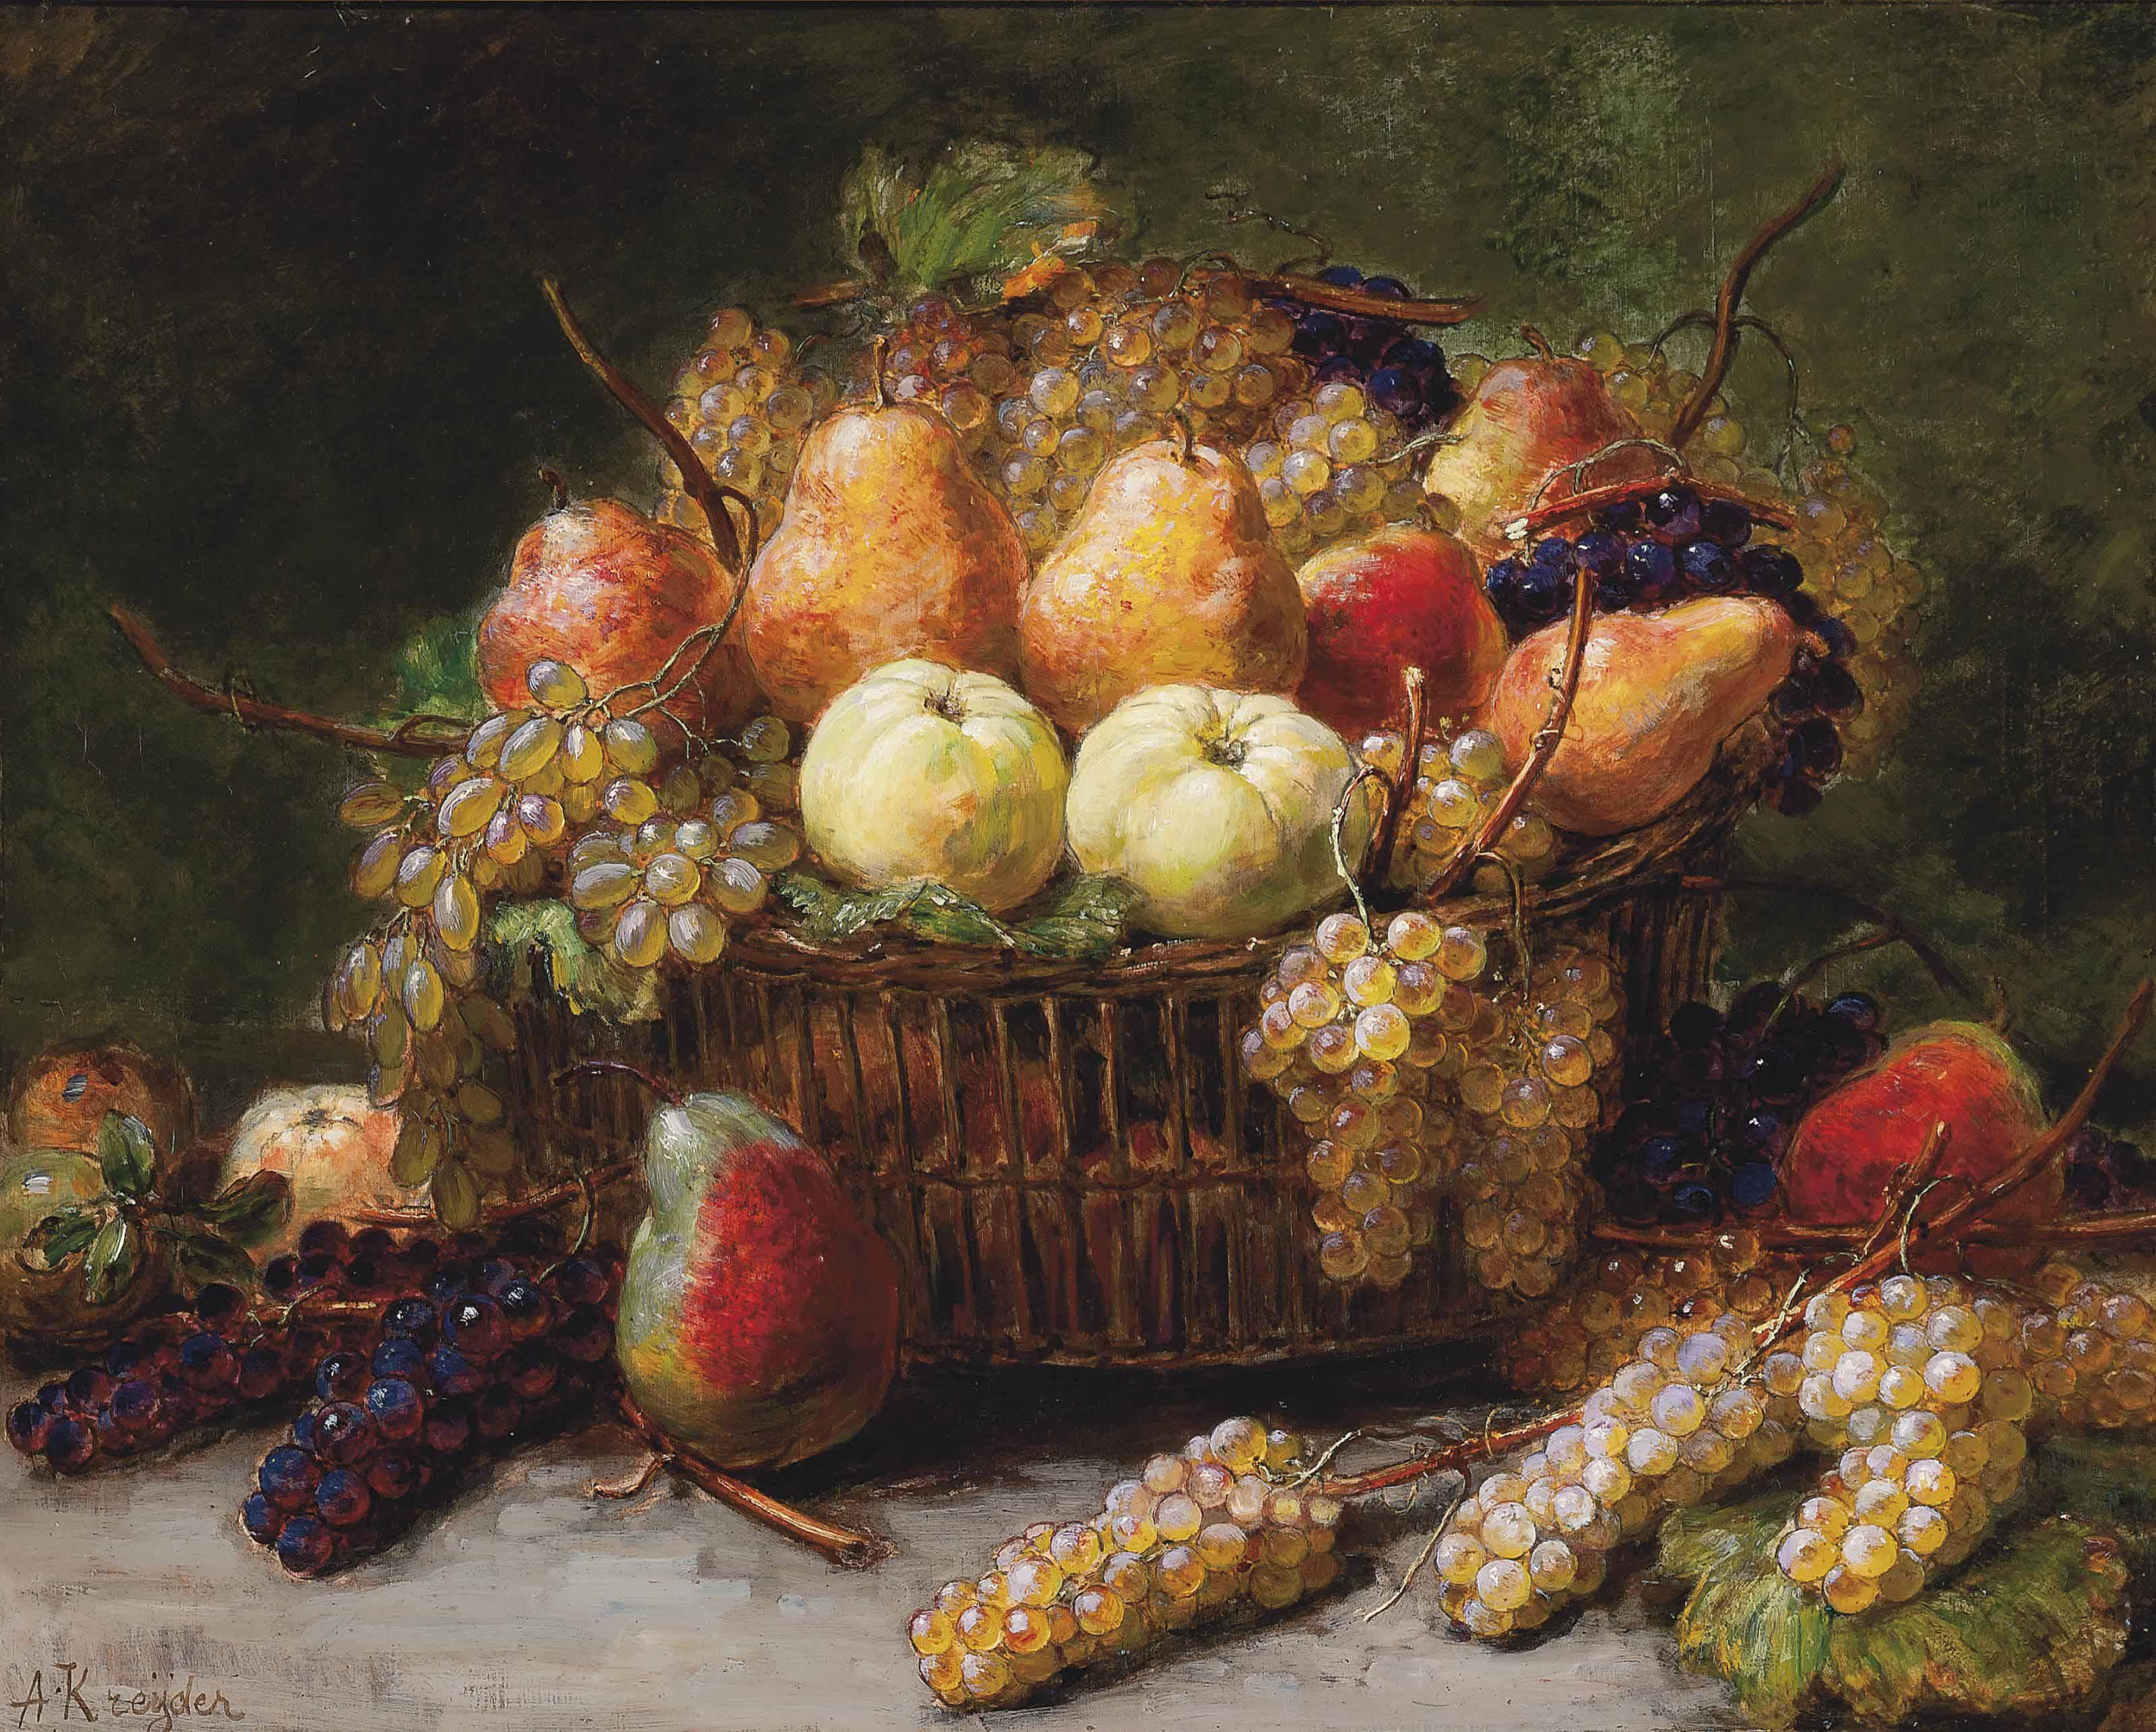 Alexis Kreyder (French, 1839-1912)